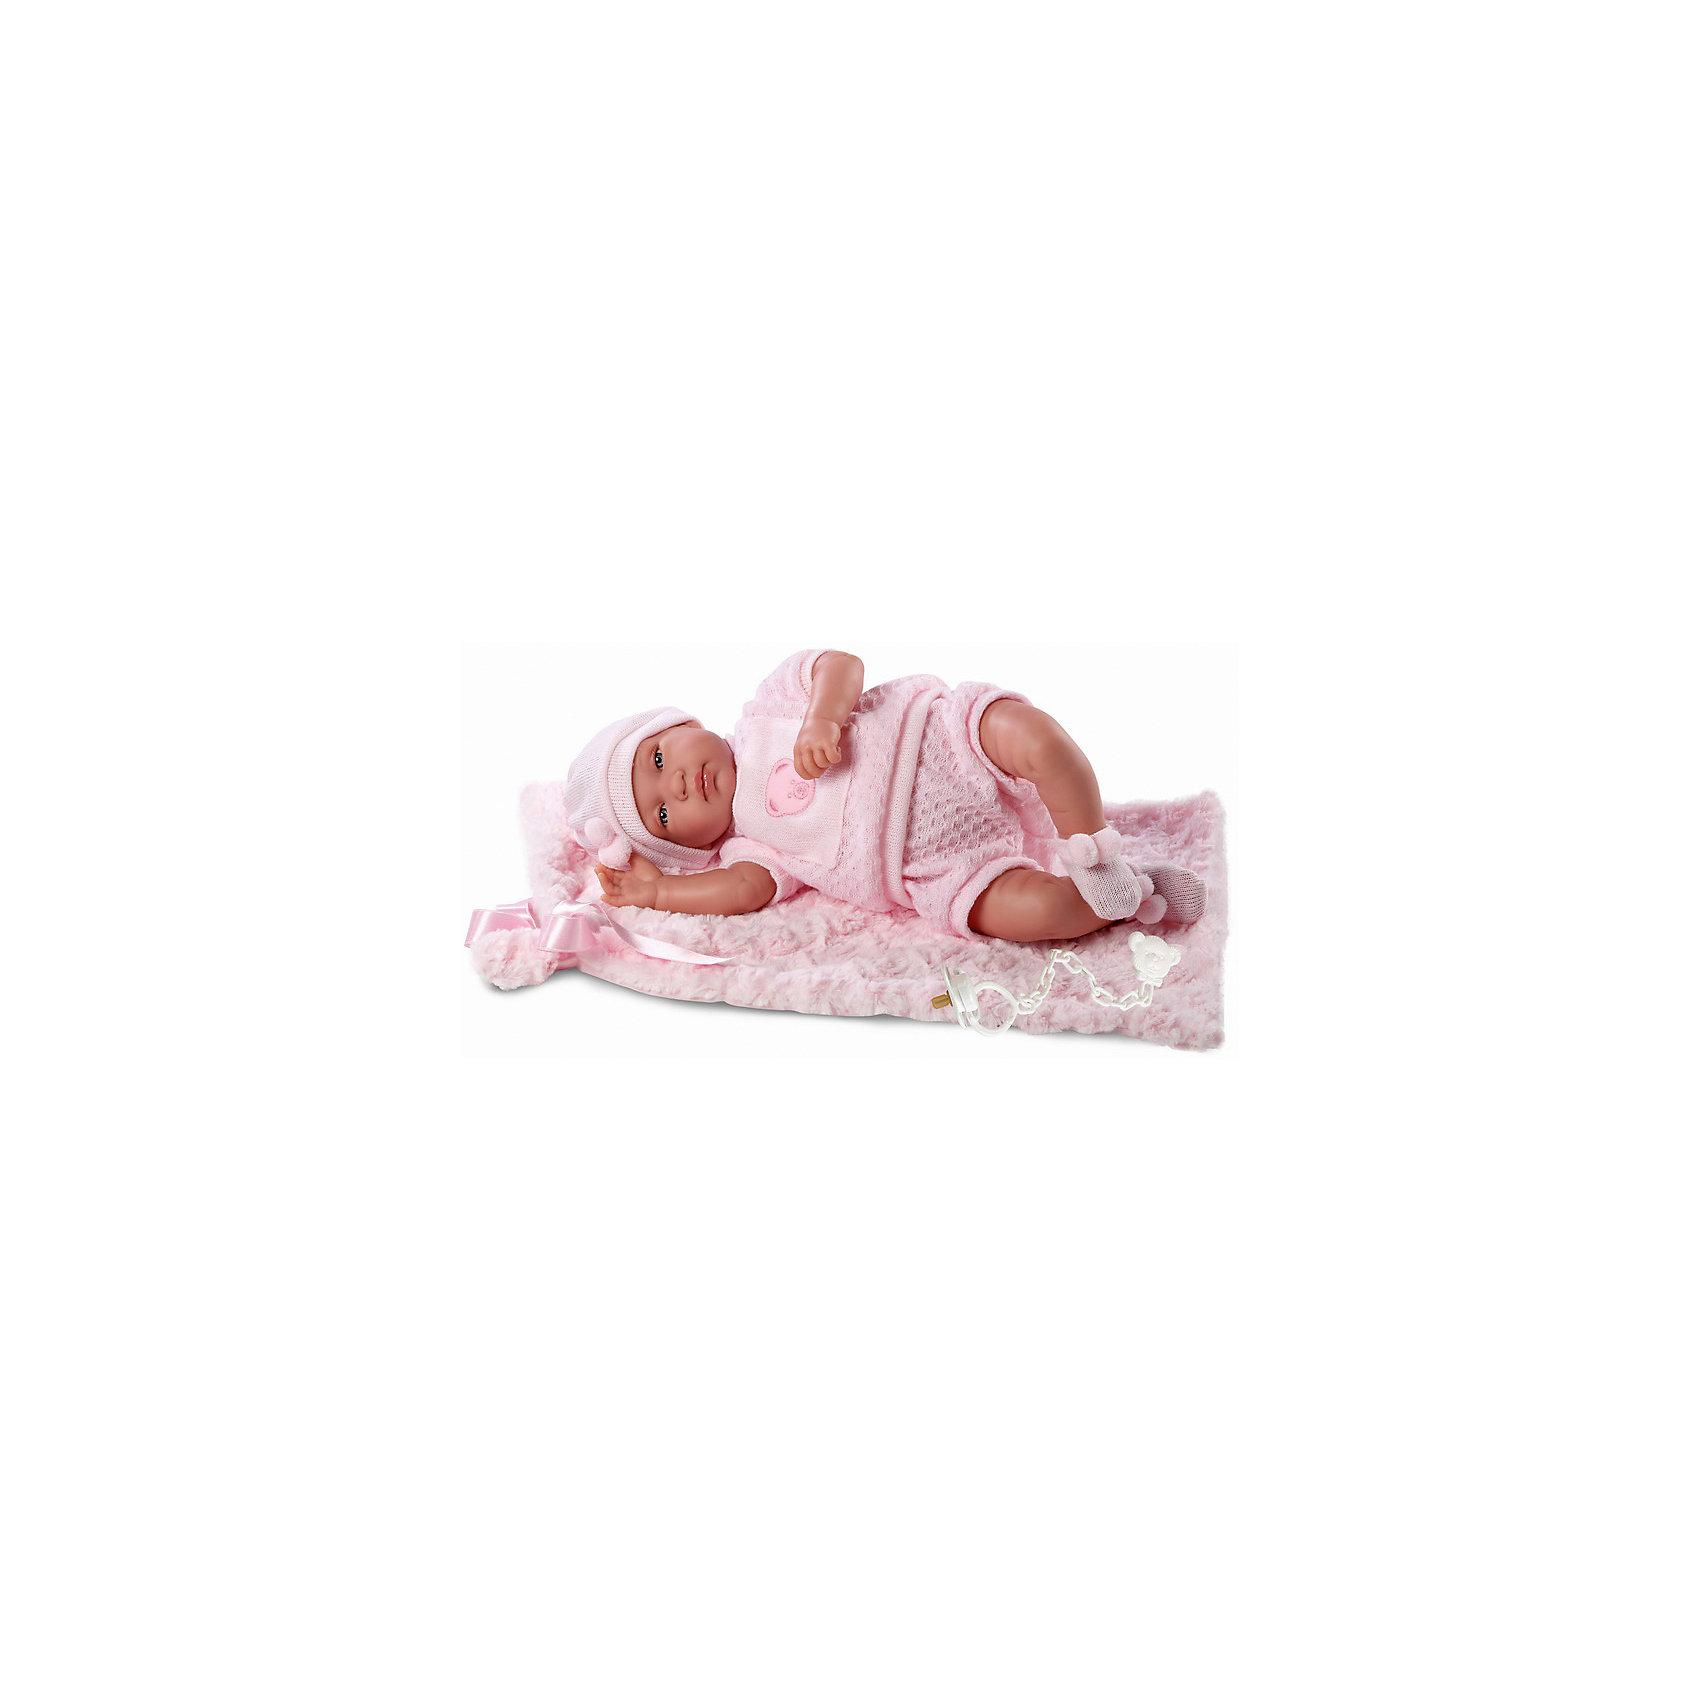 Пупс с одеялом, 43 см, Llorens<br><br>Ширина мм: 23<br>Глубина мм: 46<br>Высота мм: 13<br>Вес г: 1400<br>Возраст от месяцев: 36<br>Возраст до месяцев: 84<br>Пол: Женский<br>Возраст: Детский<br>SKU: 5086937